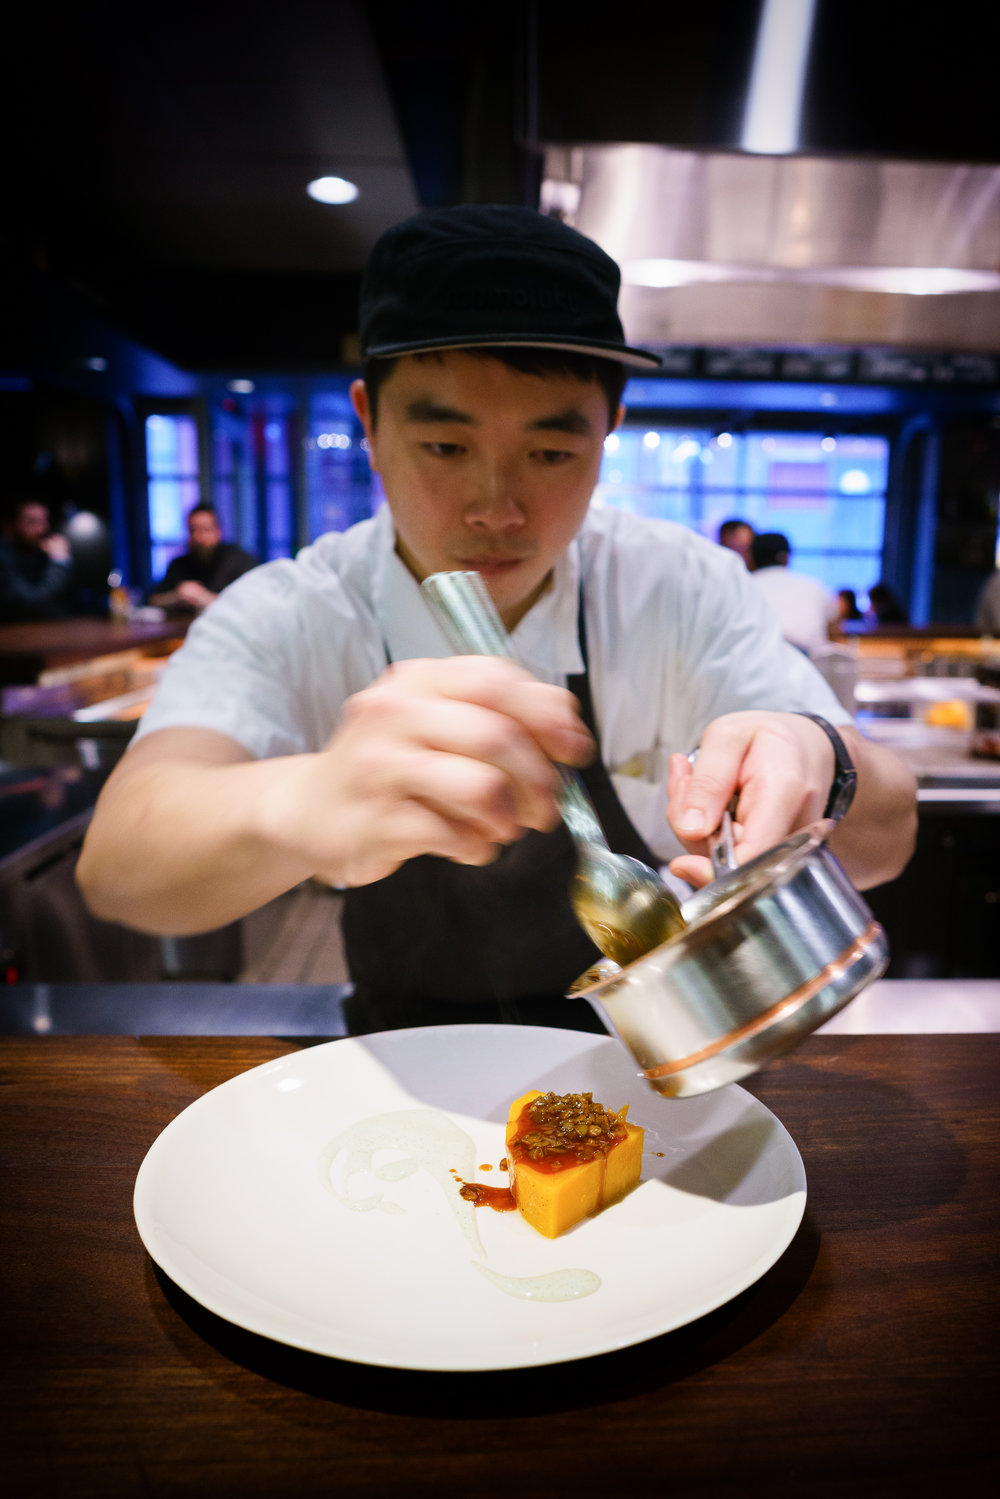 Duck - squash, serving